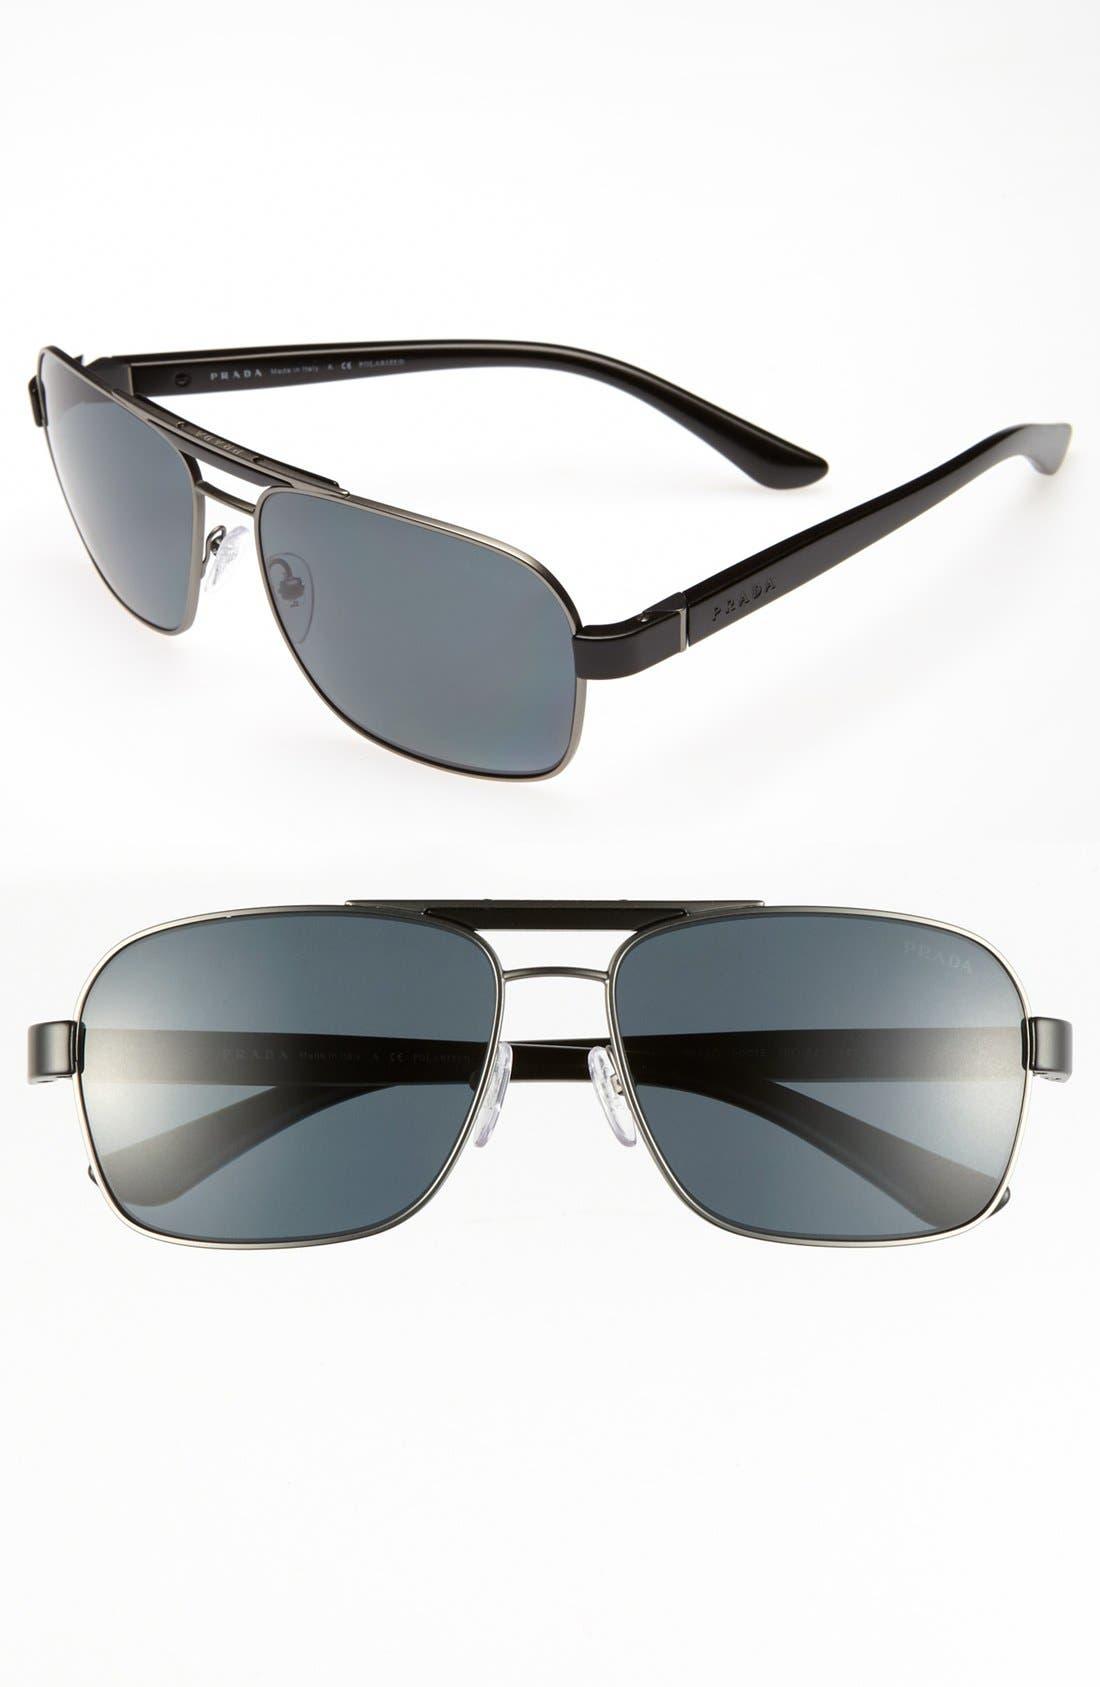 Main Image - Prada 60mm Polarized Retro Sunglasses